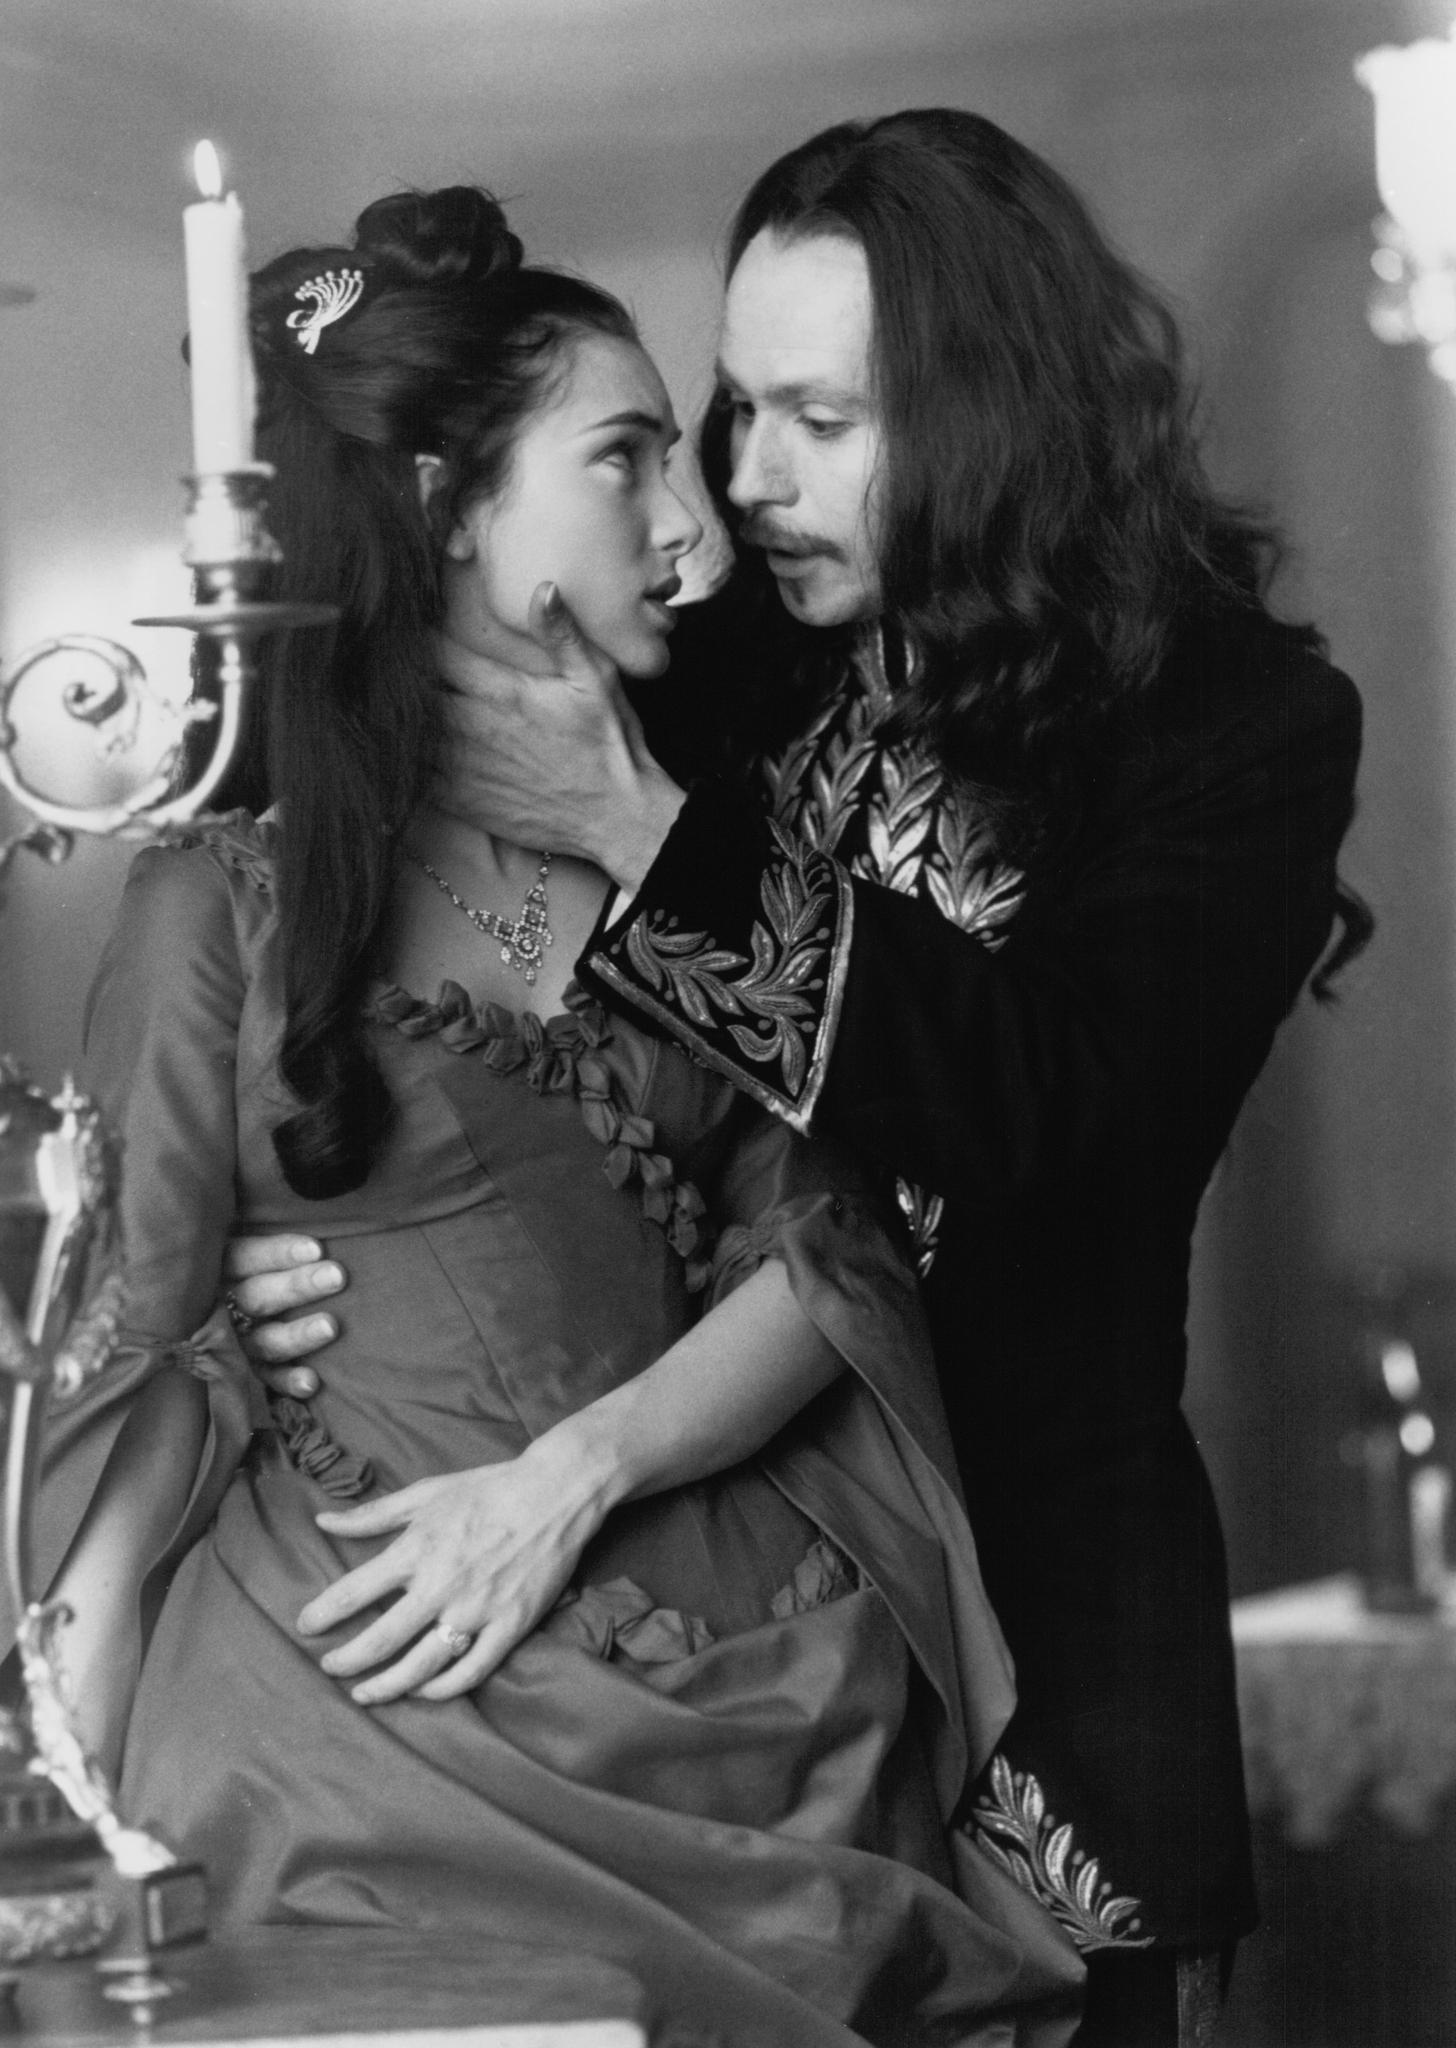 Bram Stoker S Dracula 1992 Photo Gallery Imdb